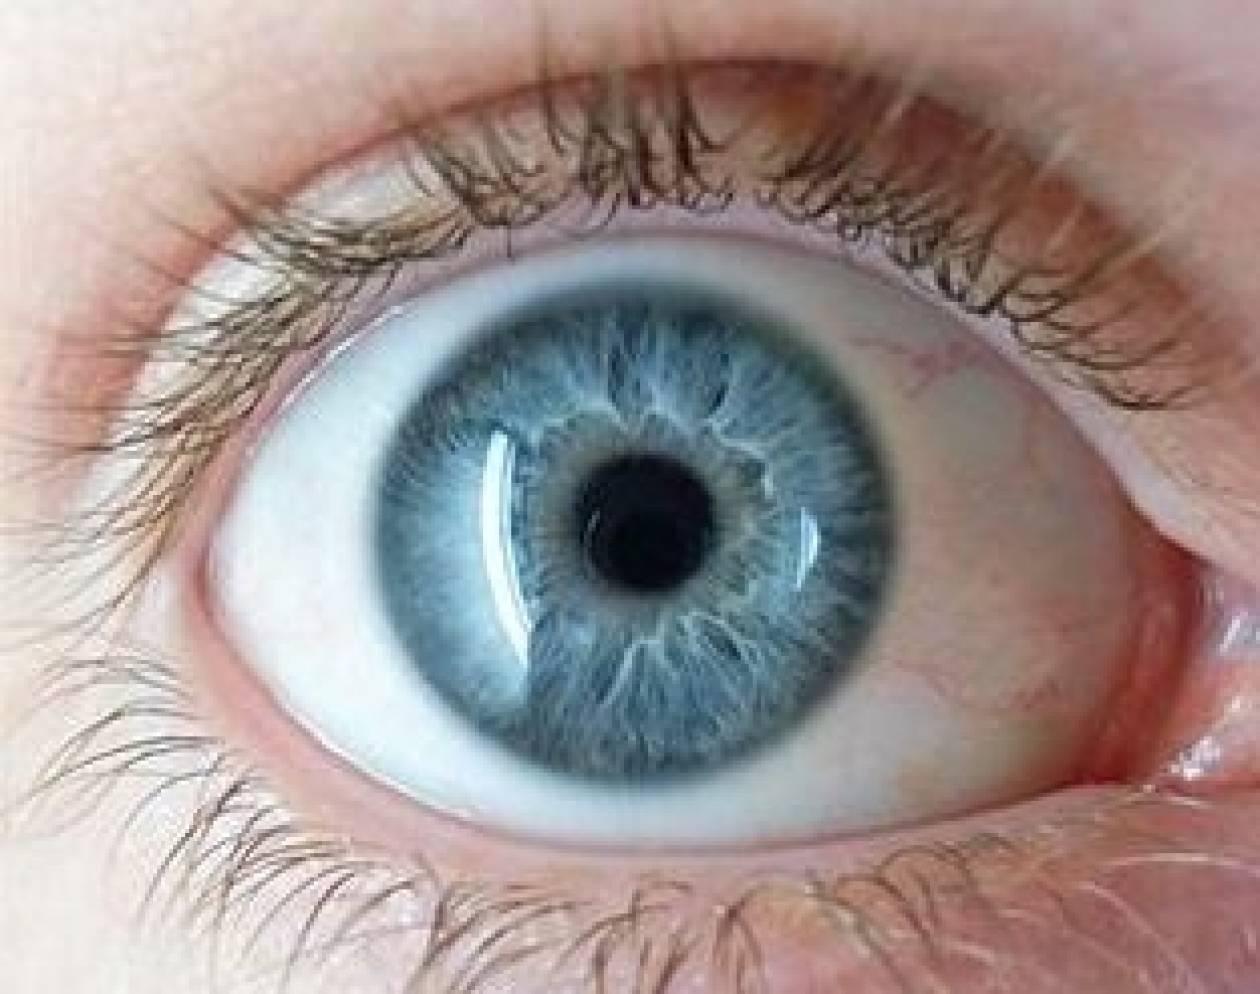 85bc2bfbe4 Τι σημαίνουν τα συμπτώματα στα μάτια - Newsbomb